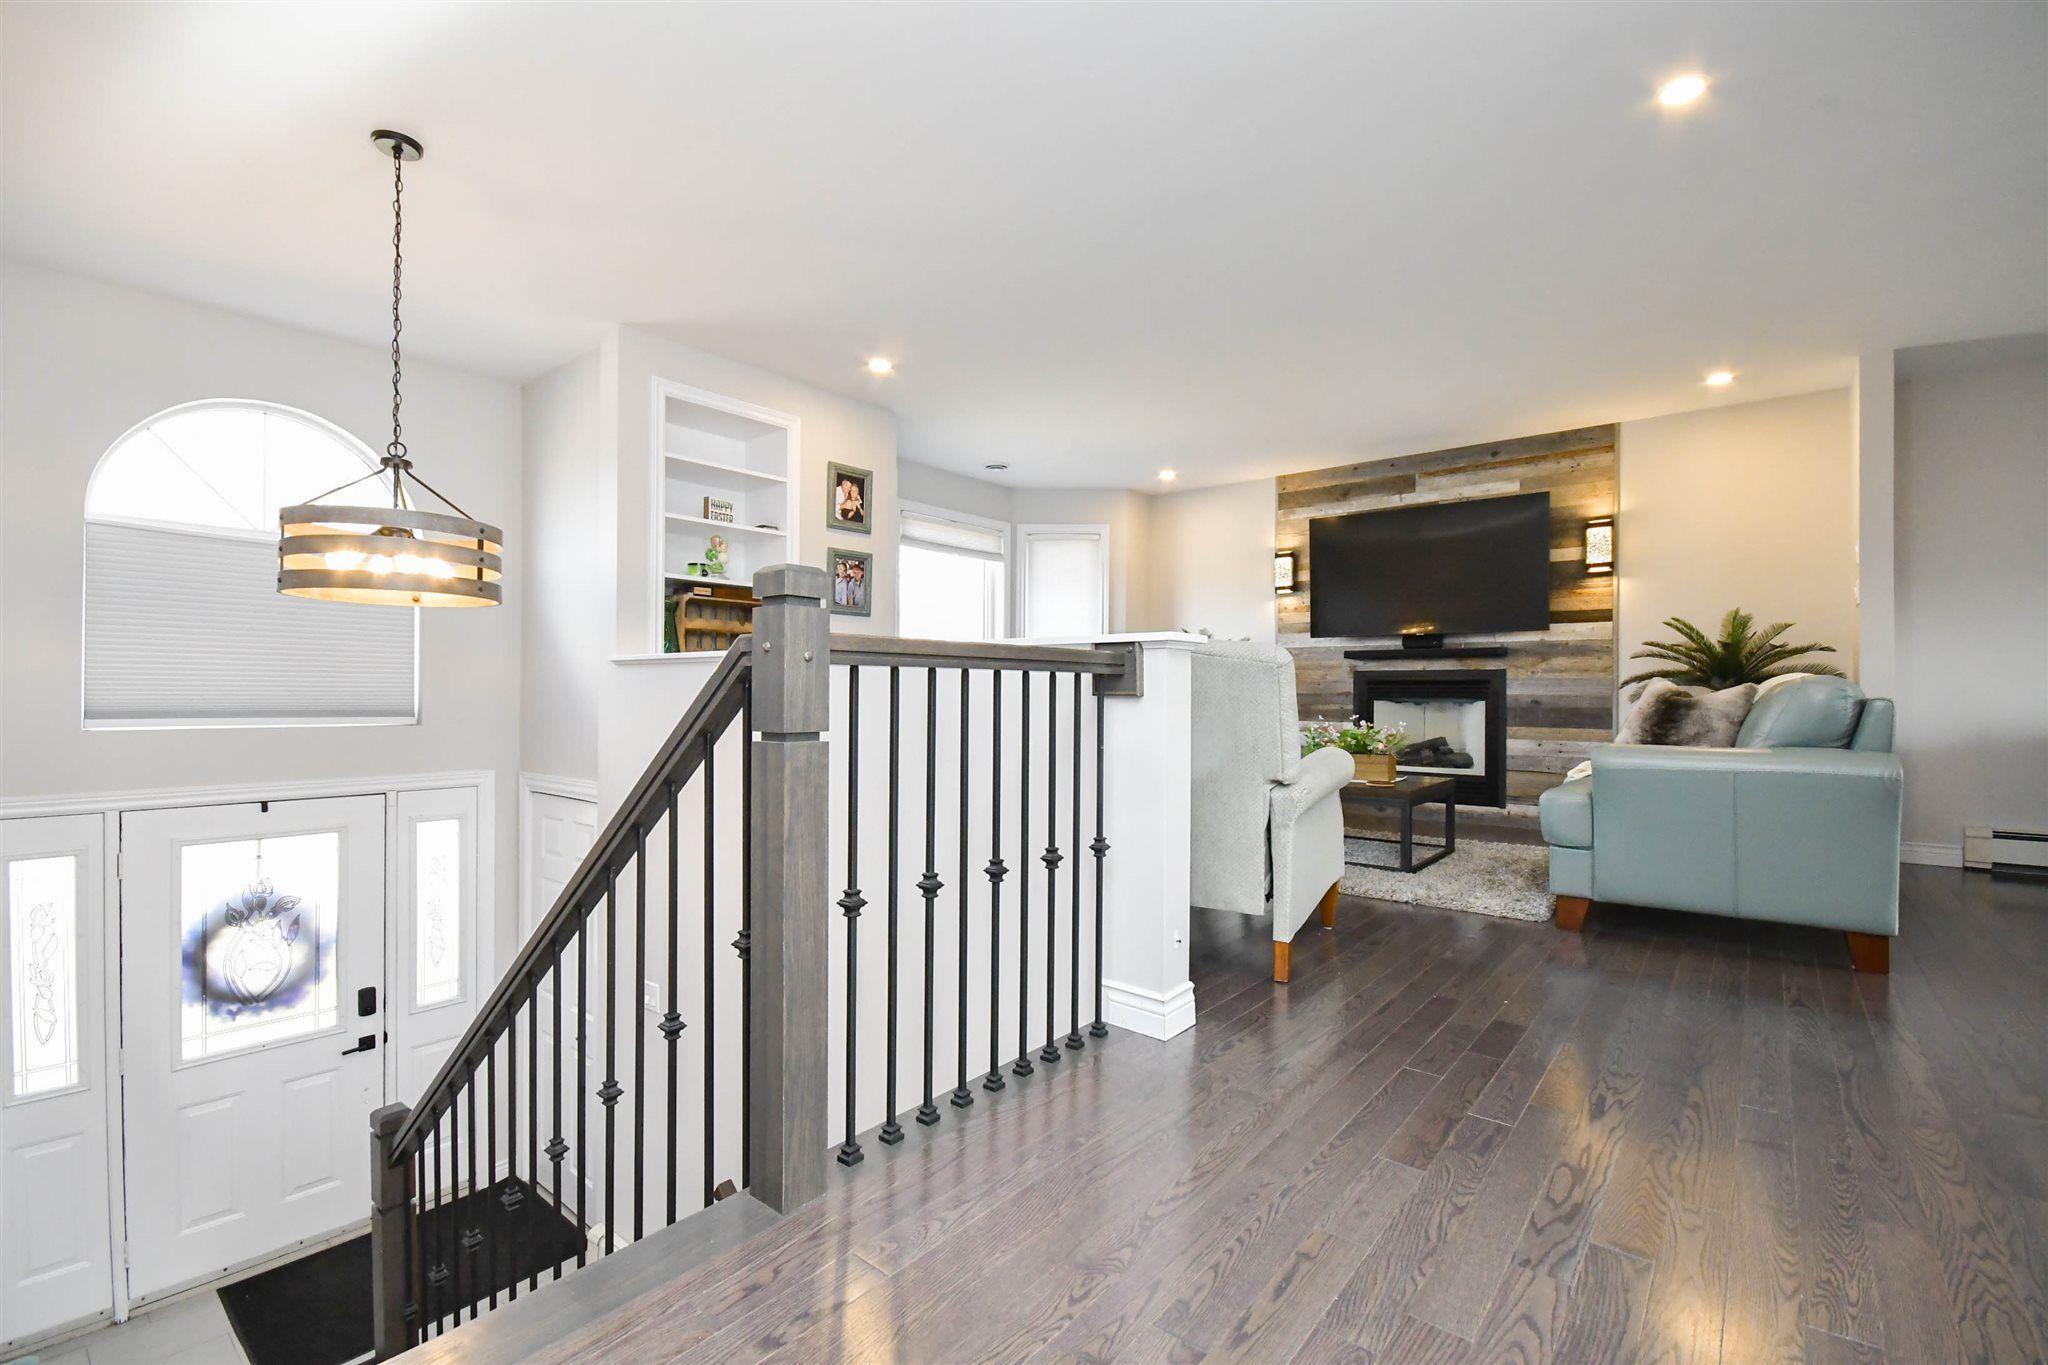 Photo 3: Photos: 17 Armstrong Court in Halifax: 5-Fairmount, Clayton Park, Rockingham Residential for sale (Halifax-Dartmouth)  : MLS®# 202105075